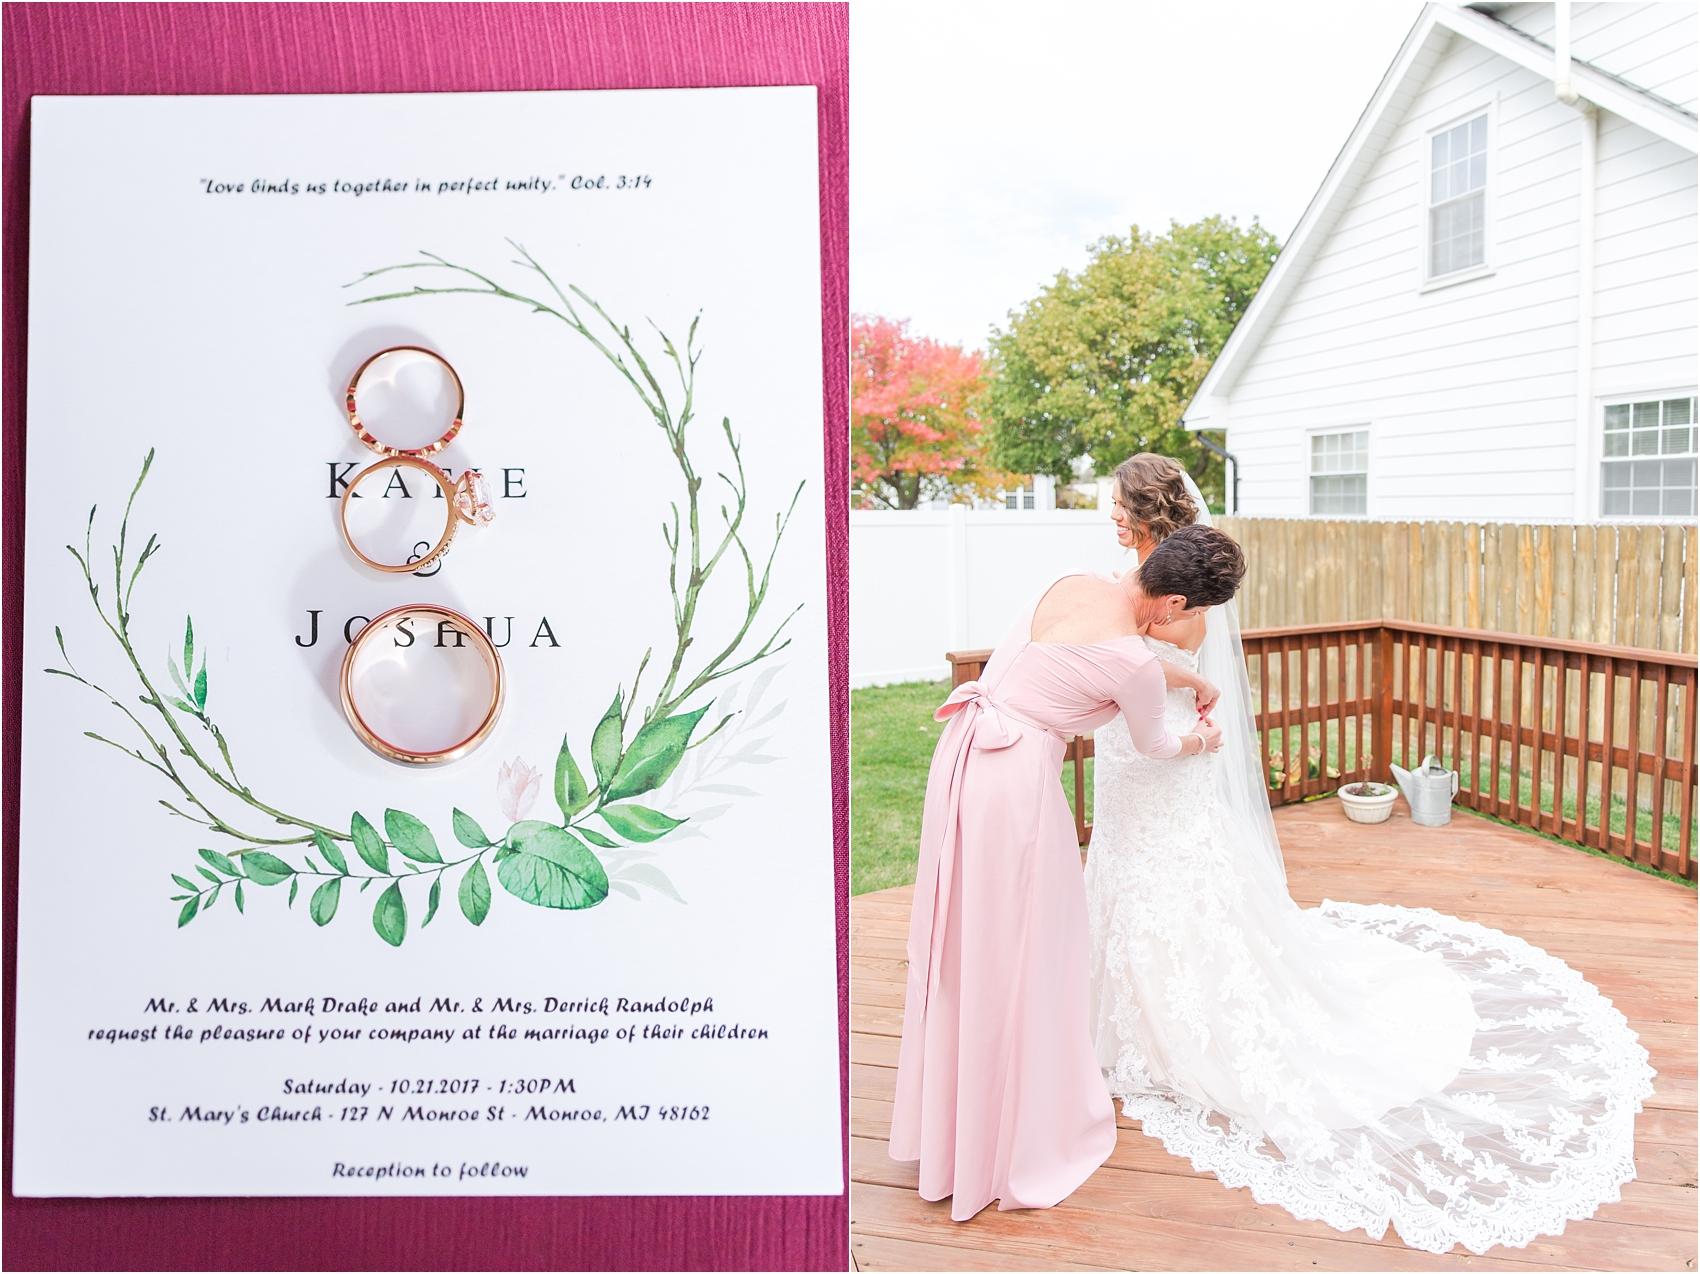 elegant-and-romantic-fall-wedding-photos-at-st-marys-catholic-church-in-monroe-michigan-by-courtney-carolyn-photography_0005.jpg